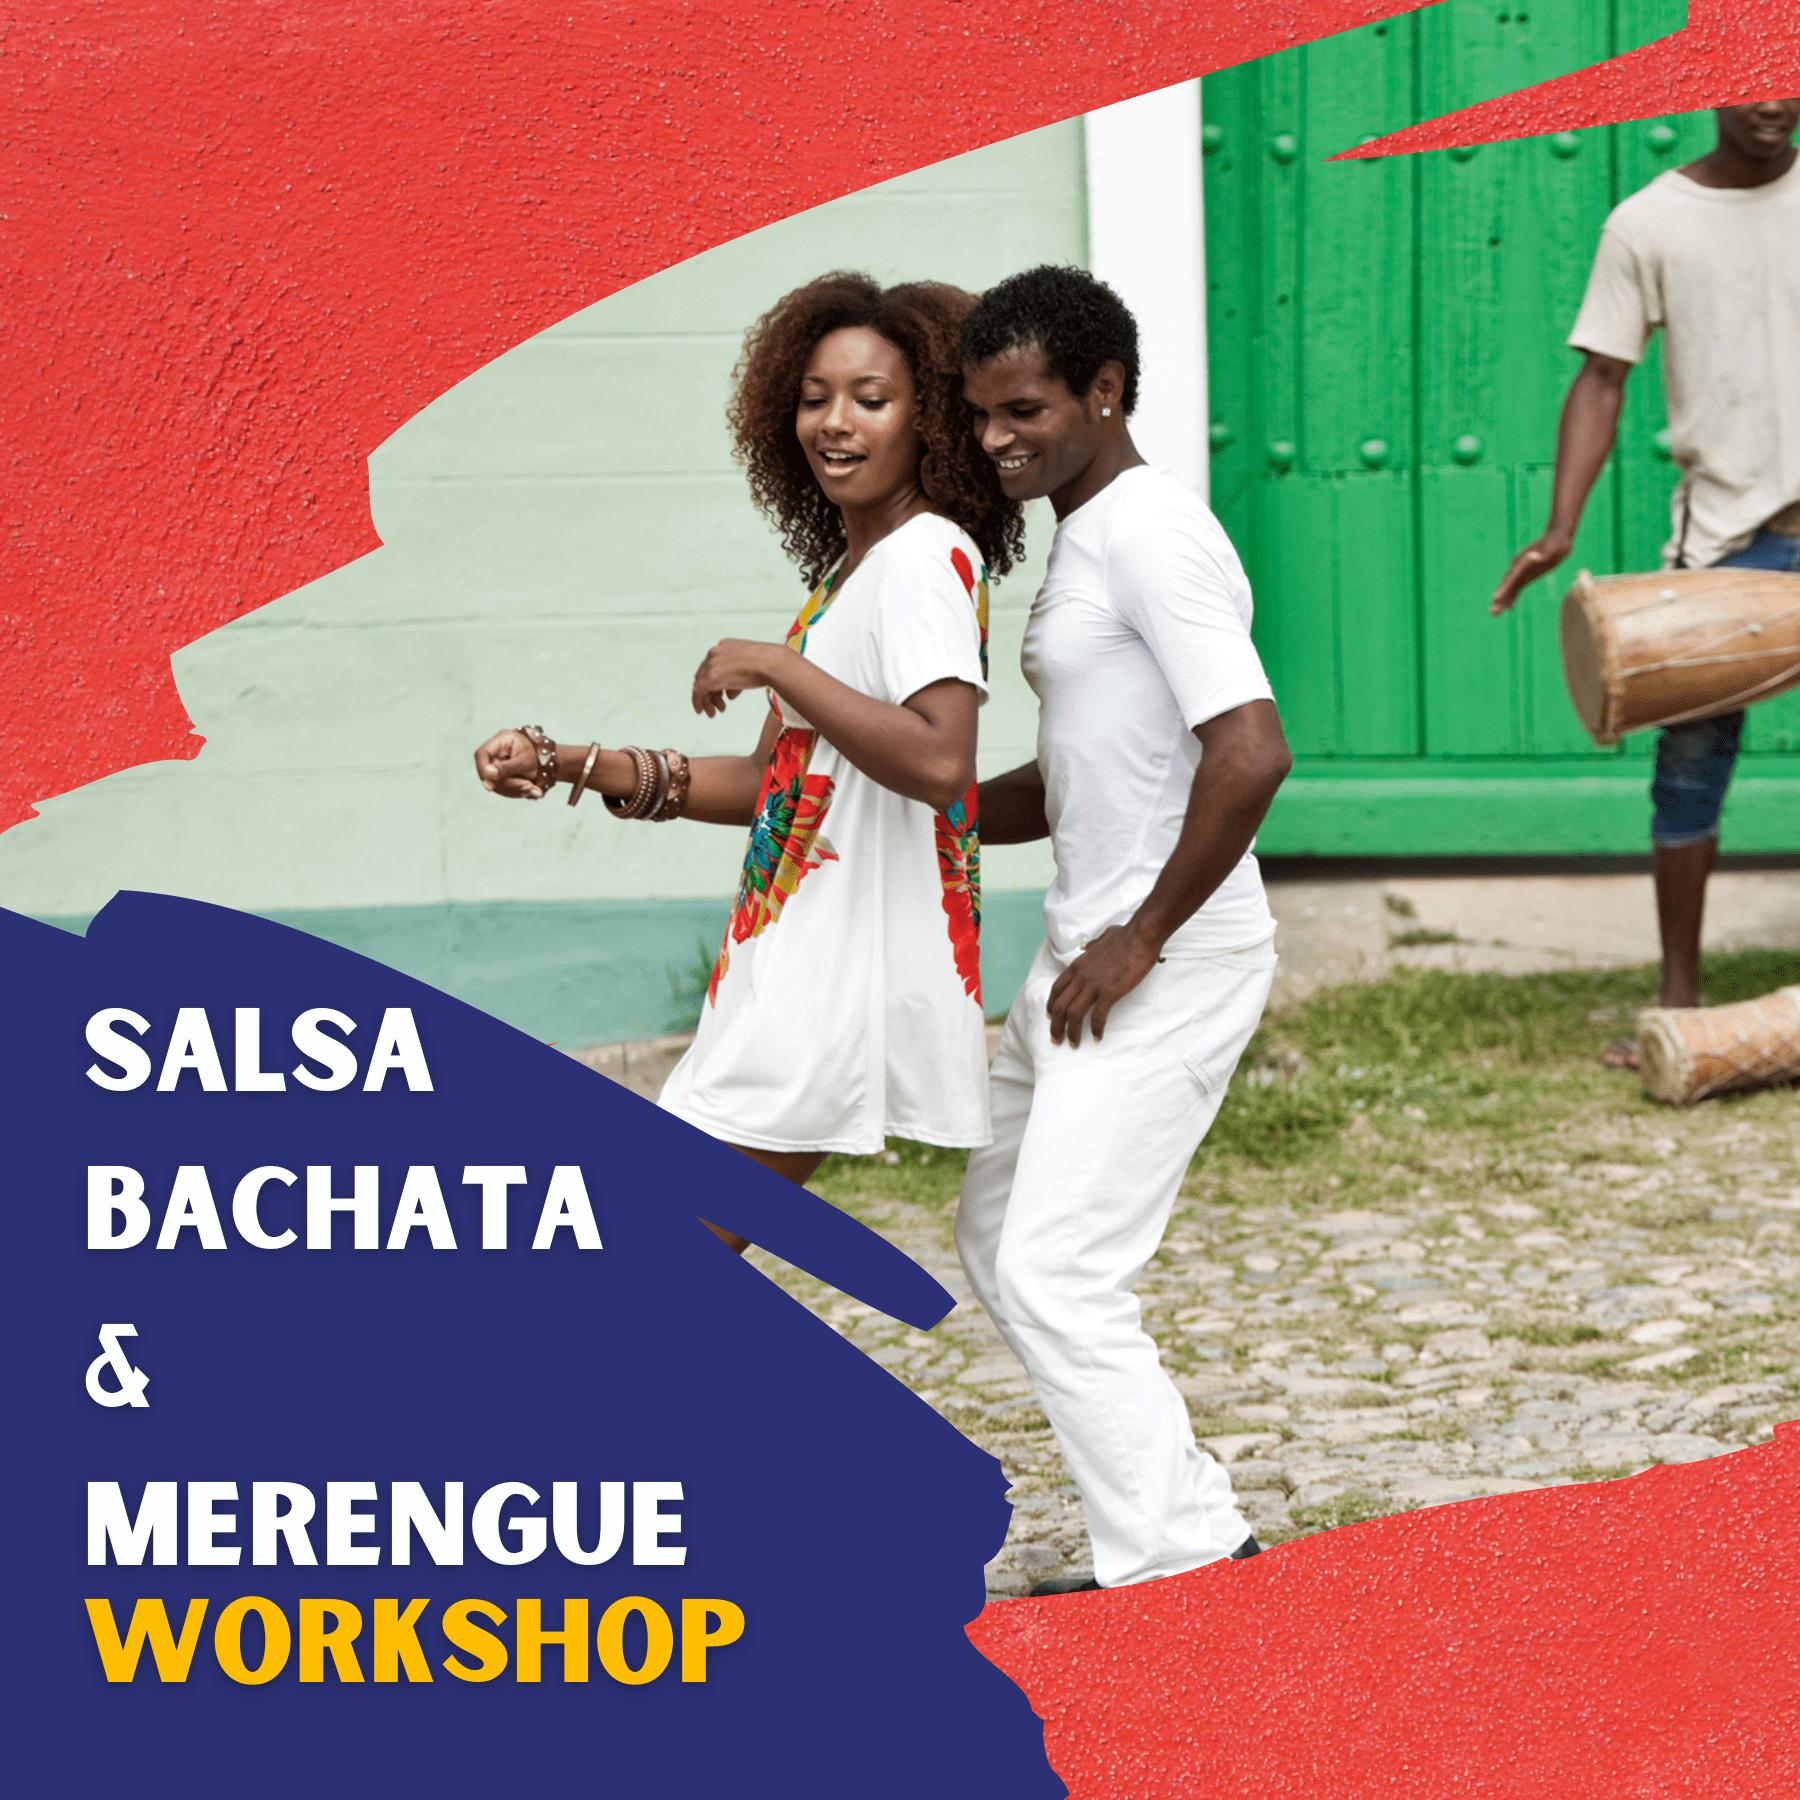 Salsa Bachata and Merengue Workshop